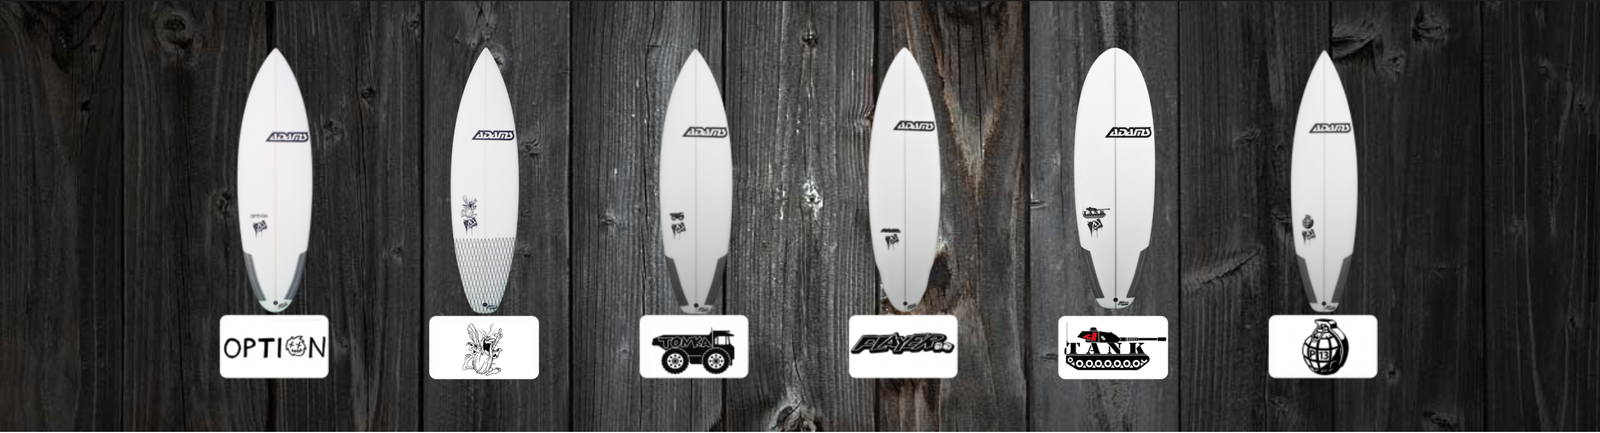 Adams Surfboards